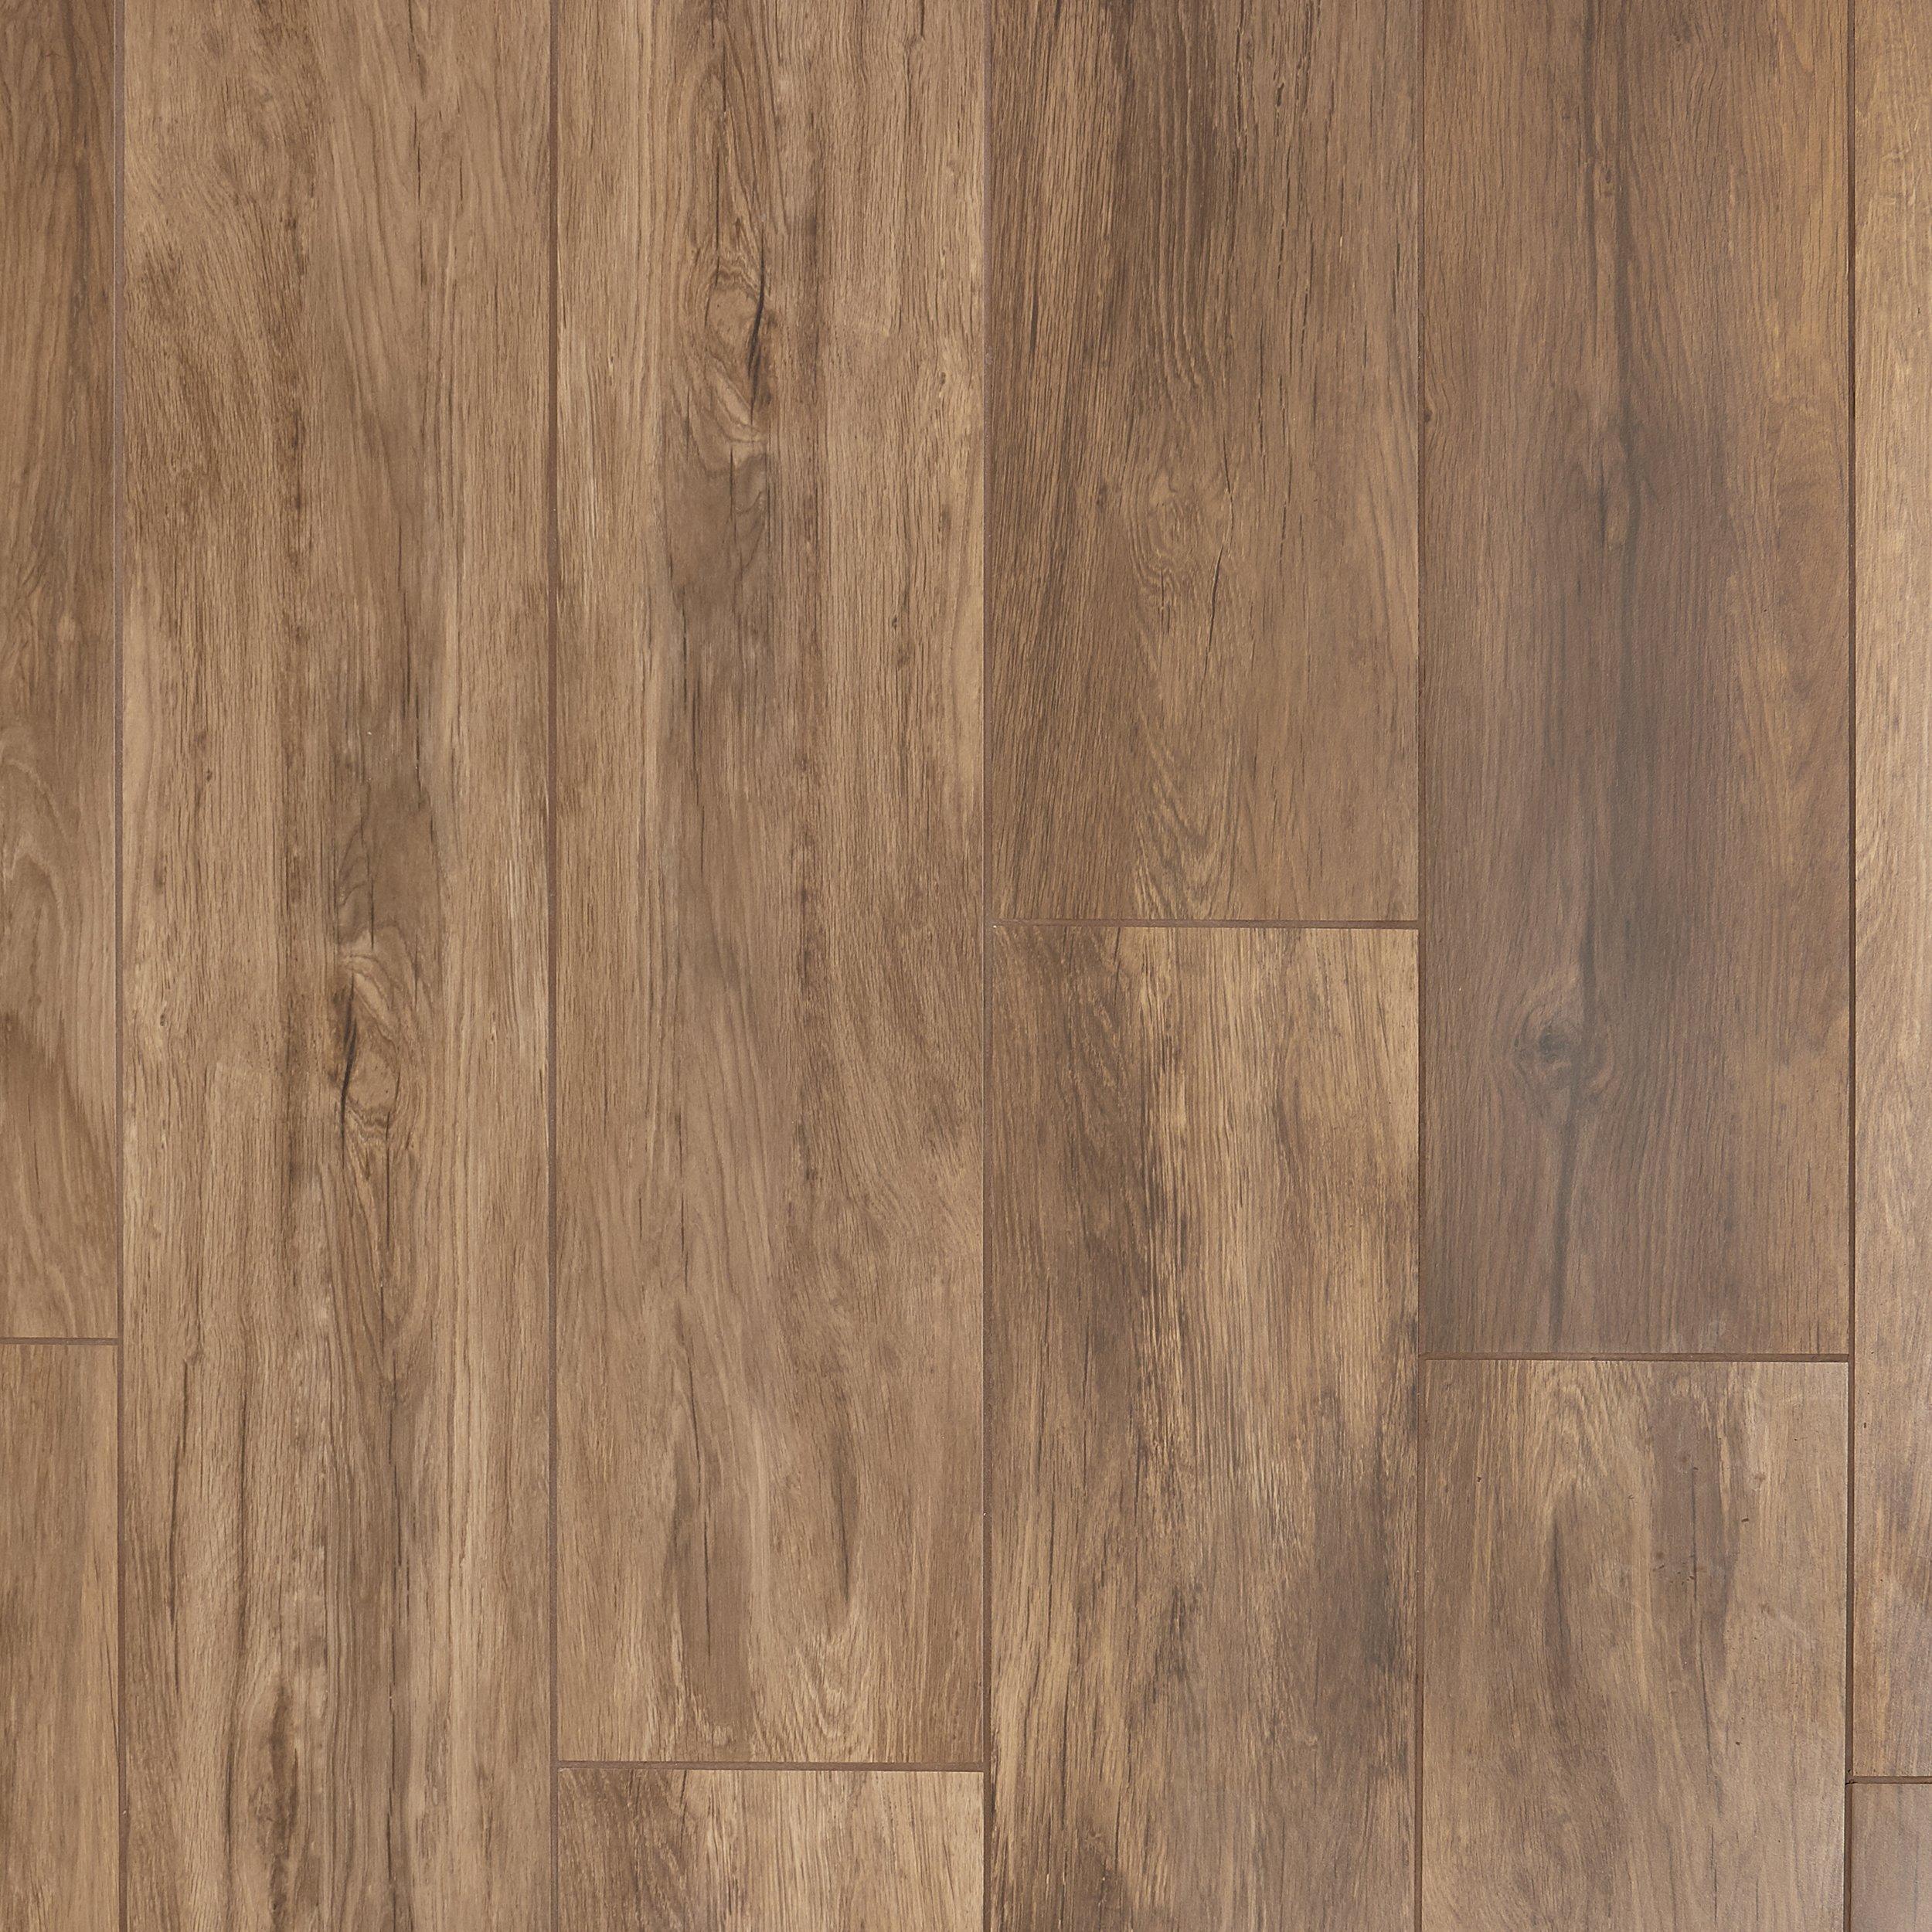 burton walnut iii wood plank porcelain